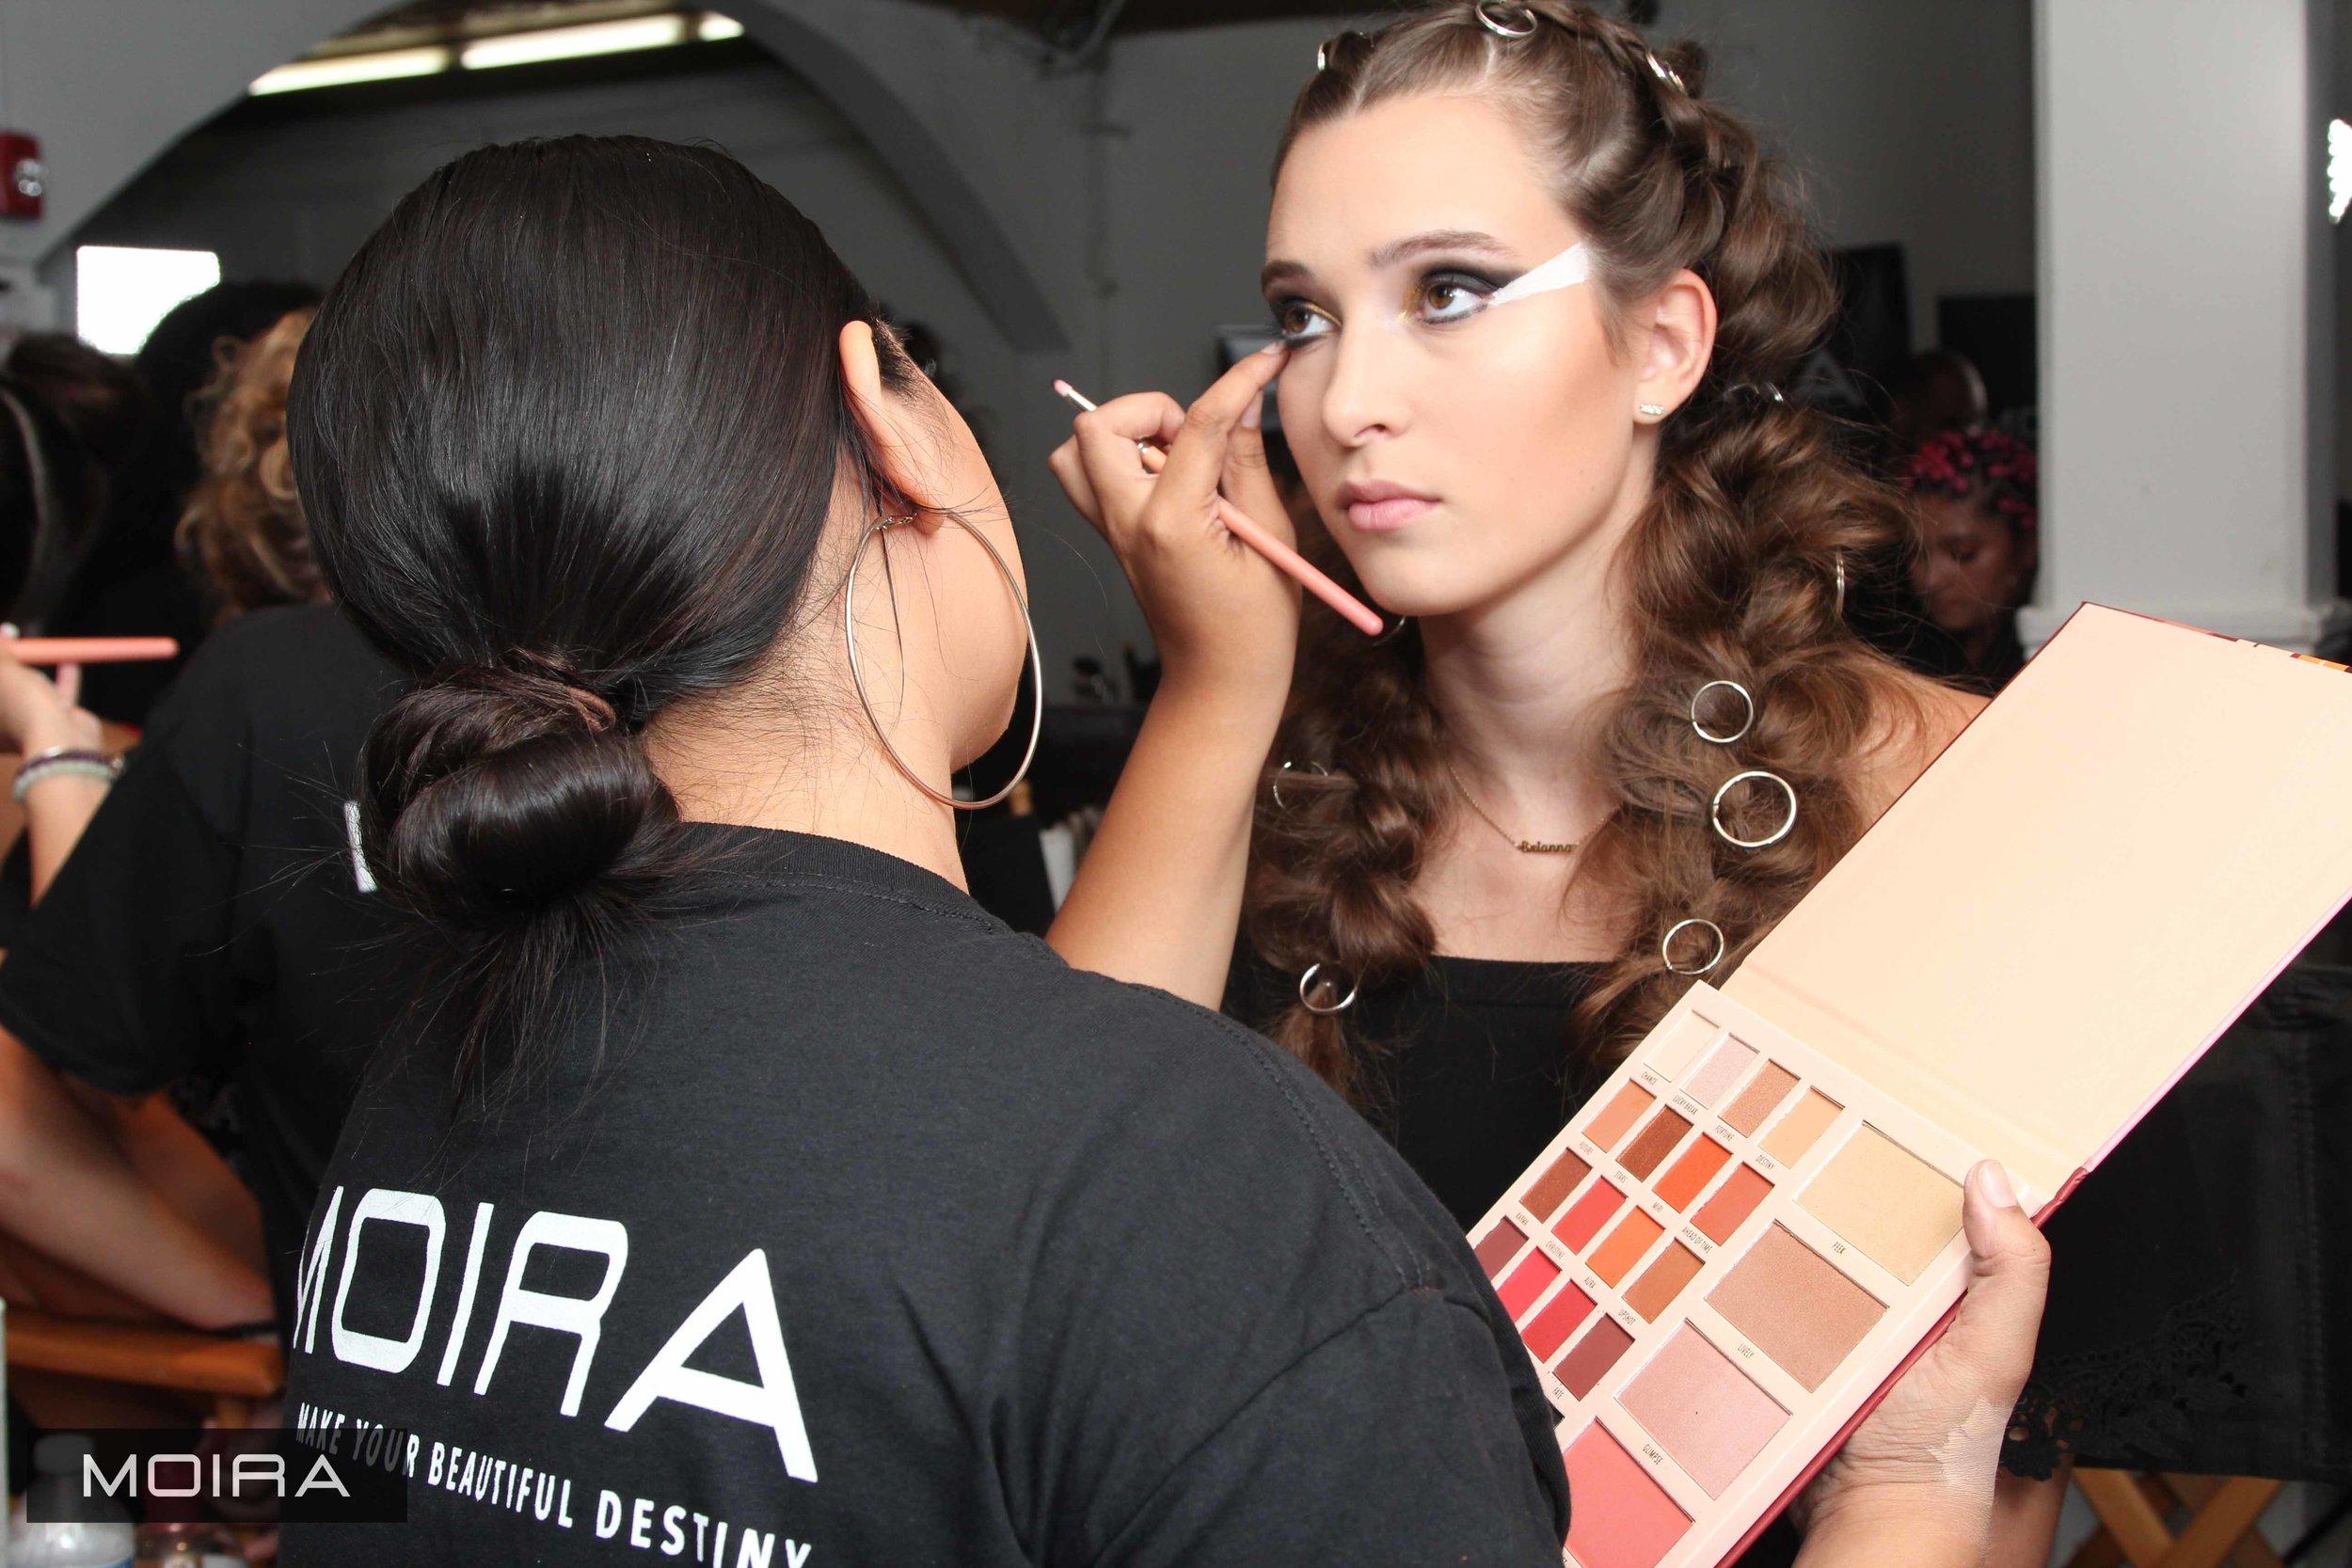 MOIRA_Cosmetics_New_York_Fashion_Week_2018-26.jpg